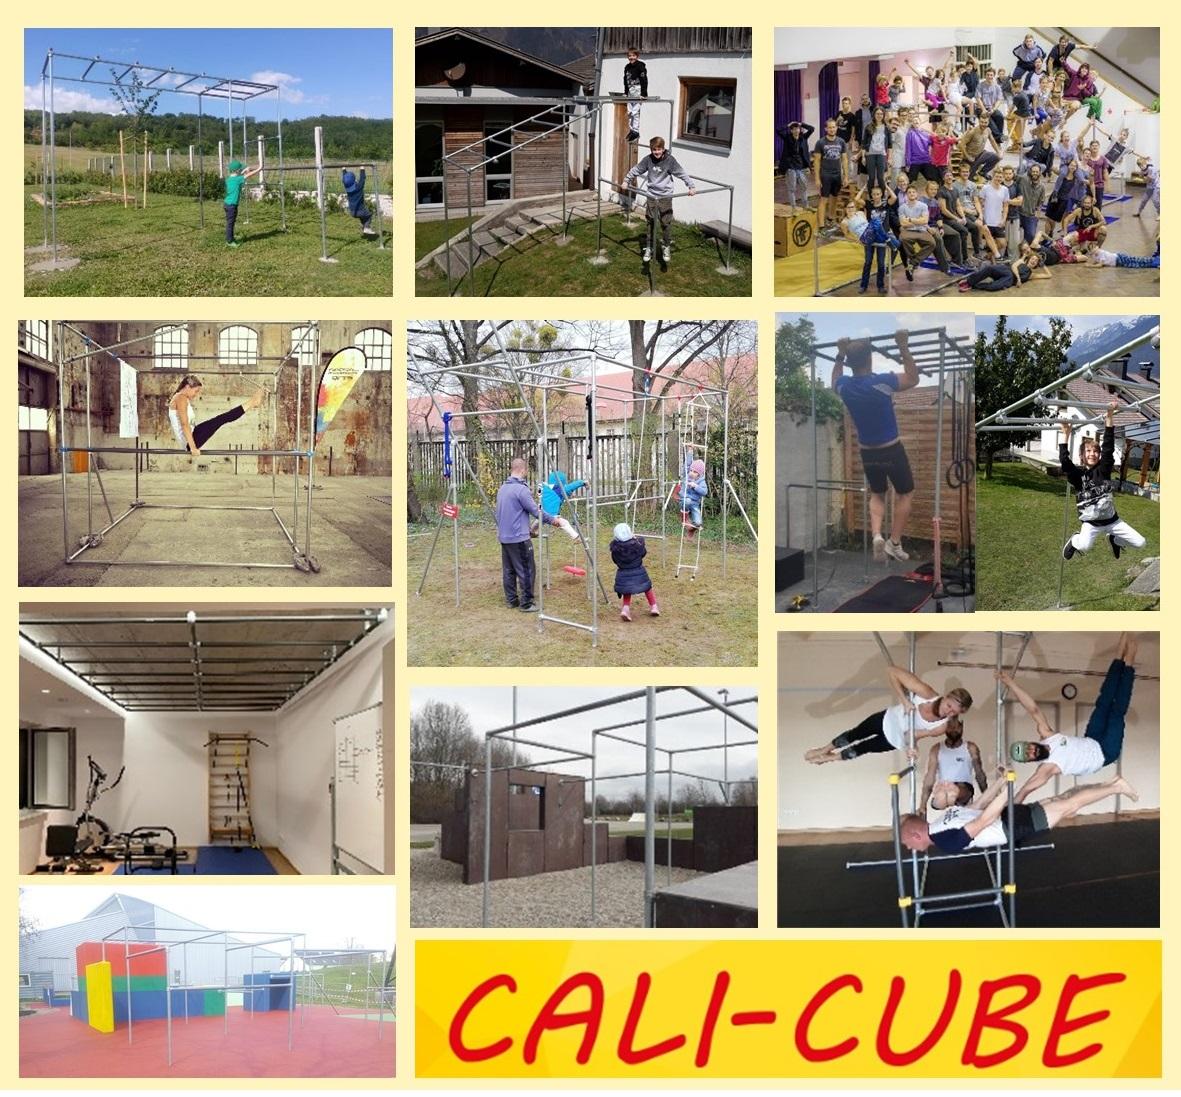 CALI-CUBE verwirklicht Fitness-Träume